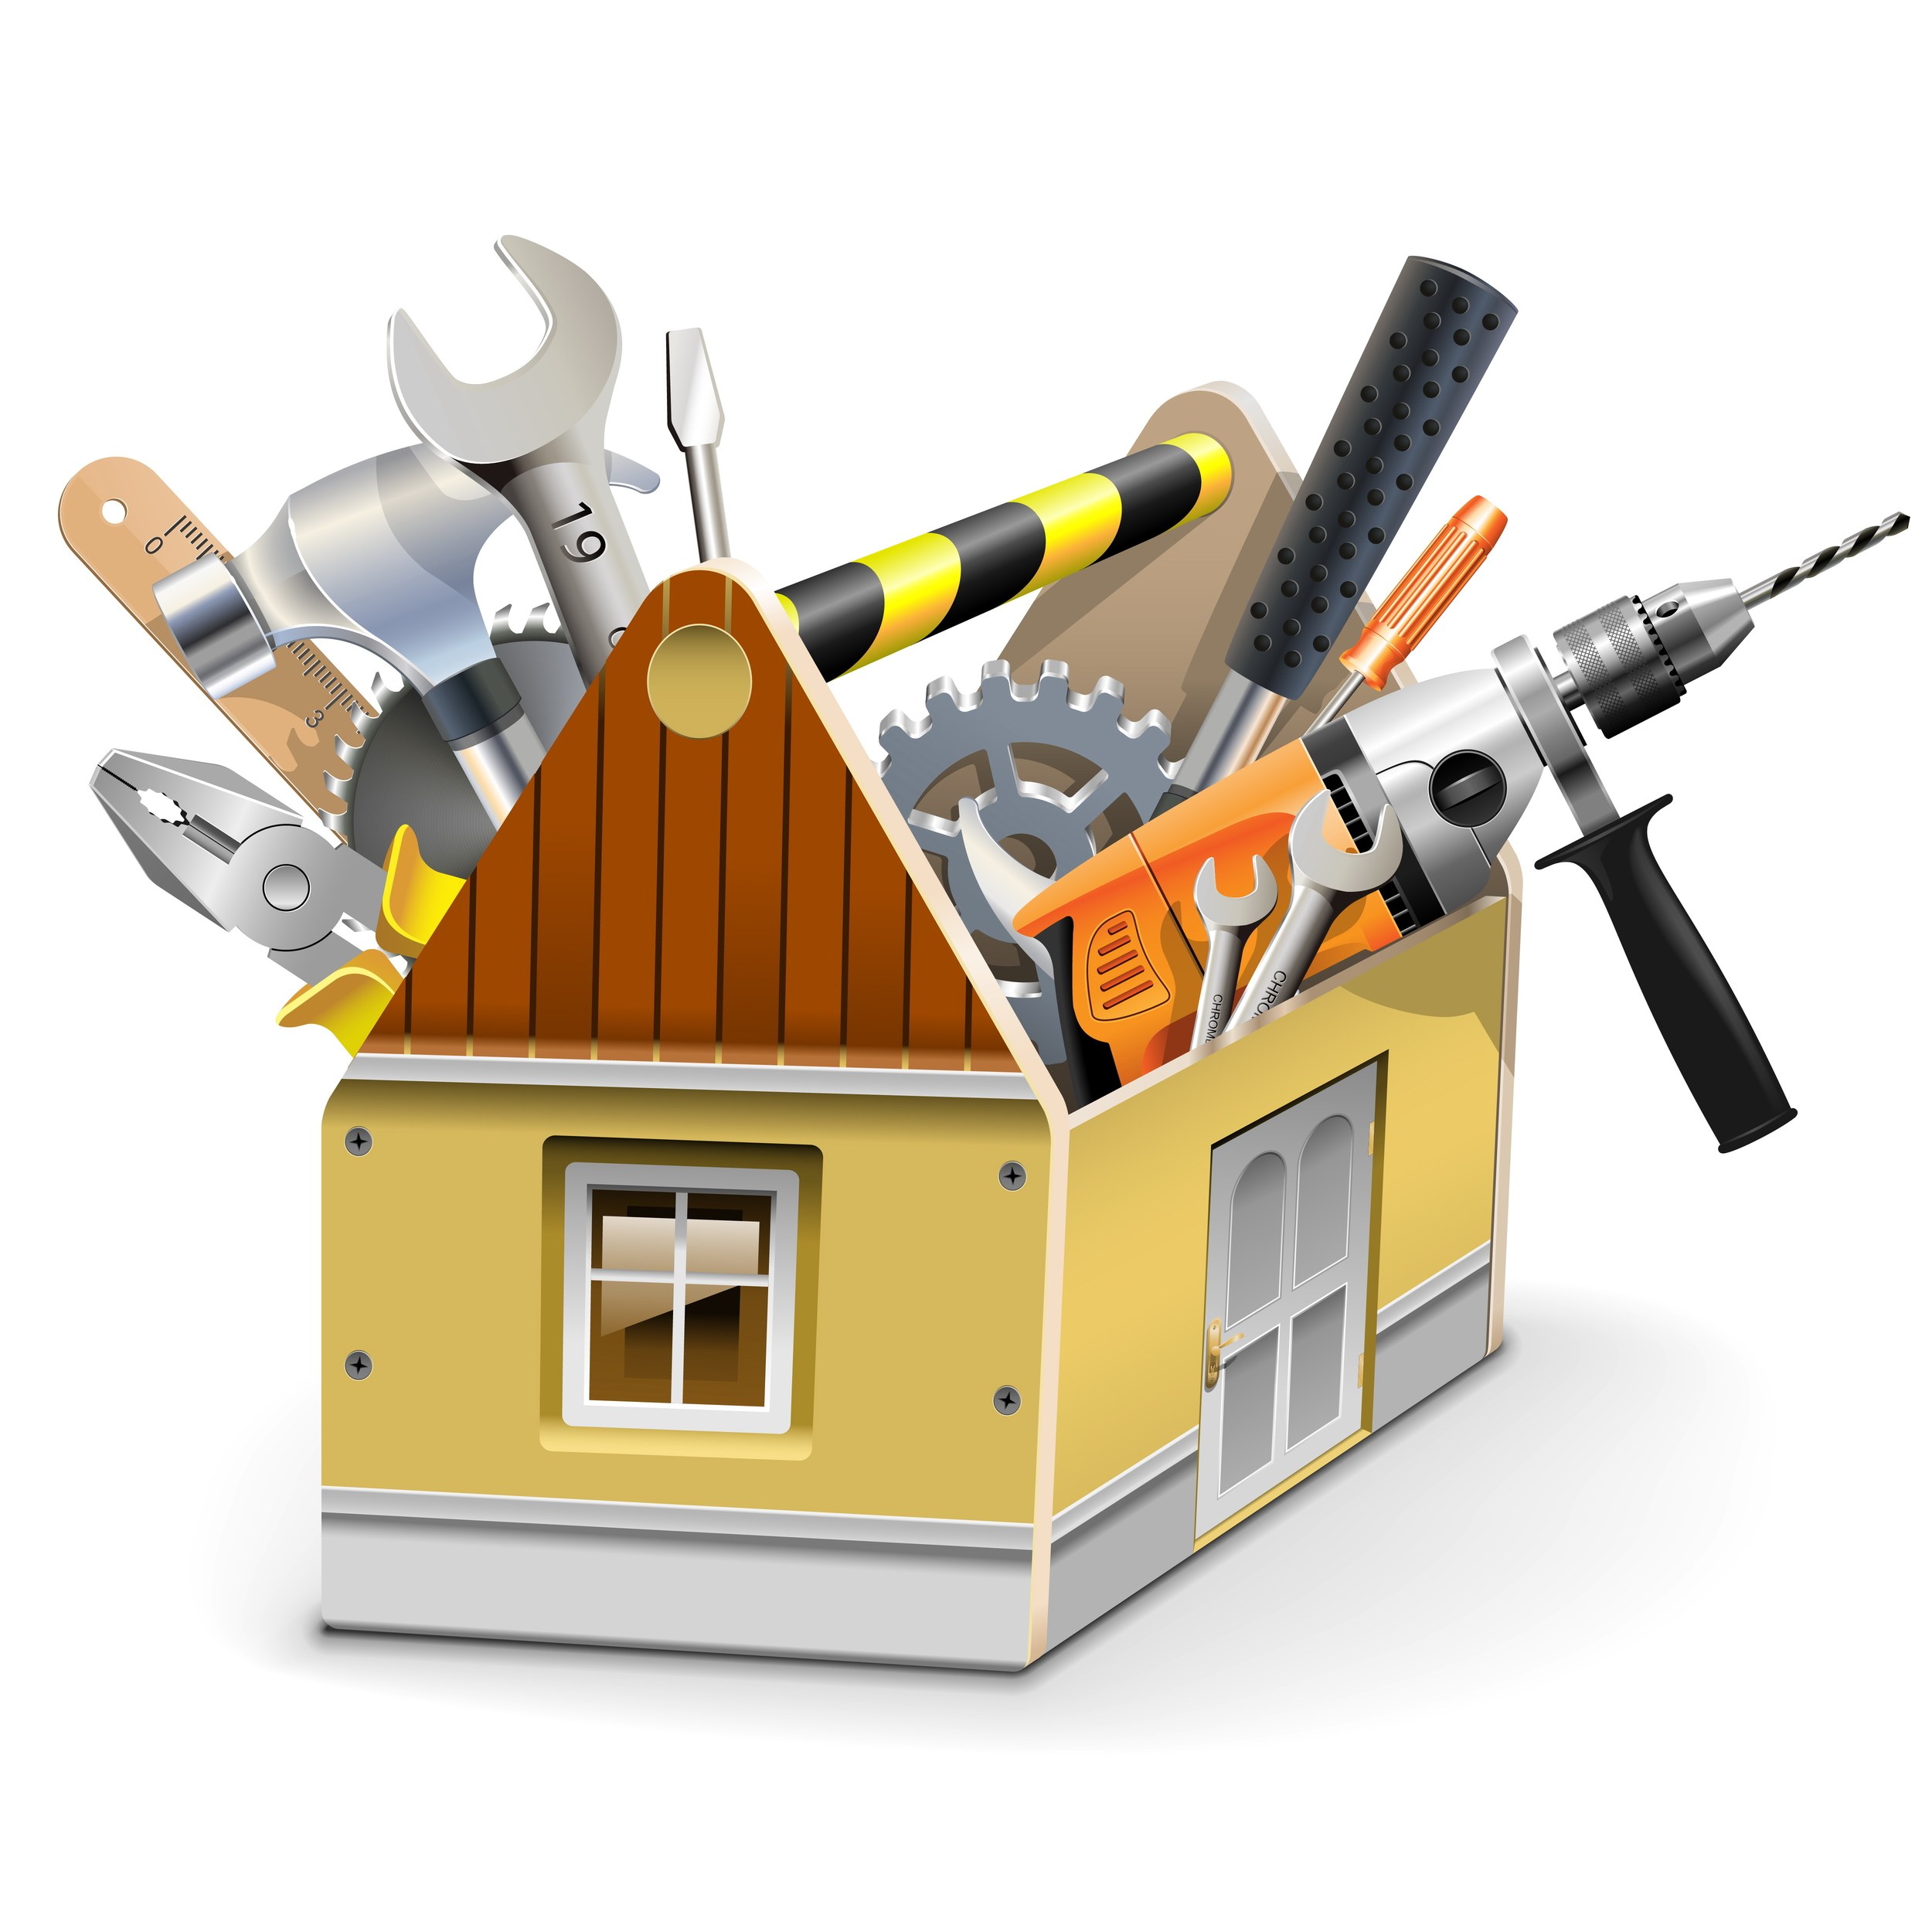 bigstock-Vector-House-Toolbox-88194653.jpg